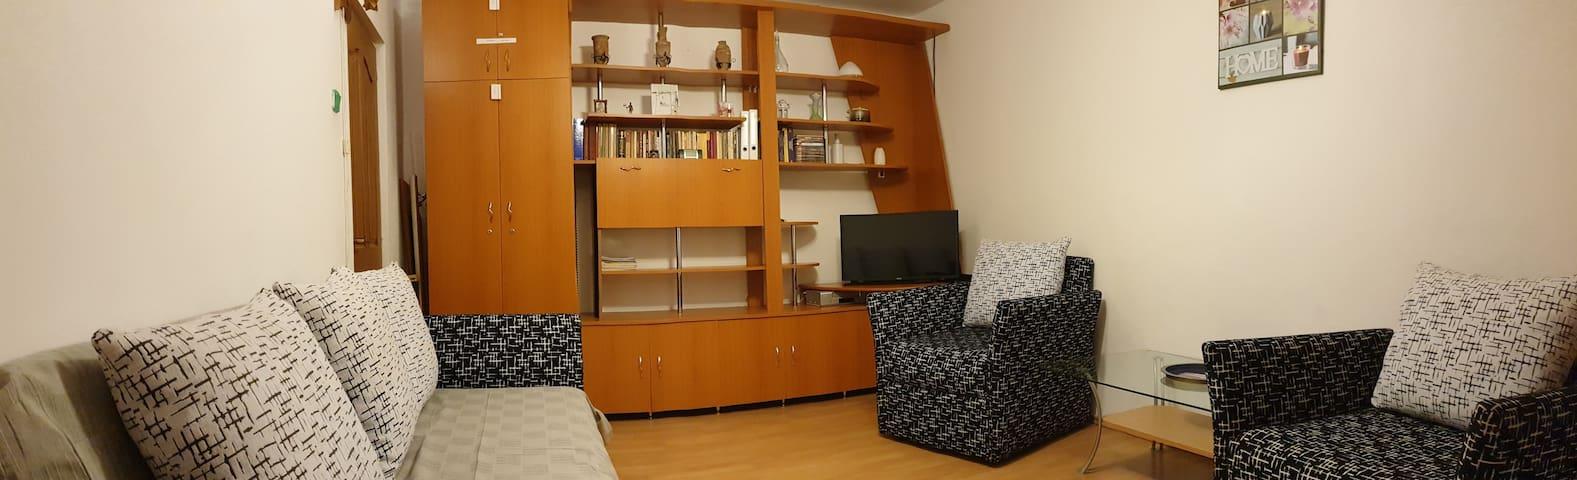 Eurobuc South Apartment